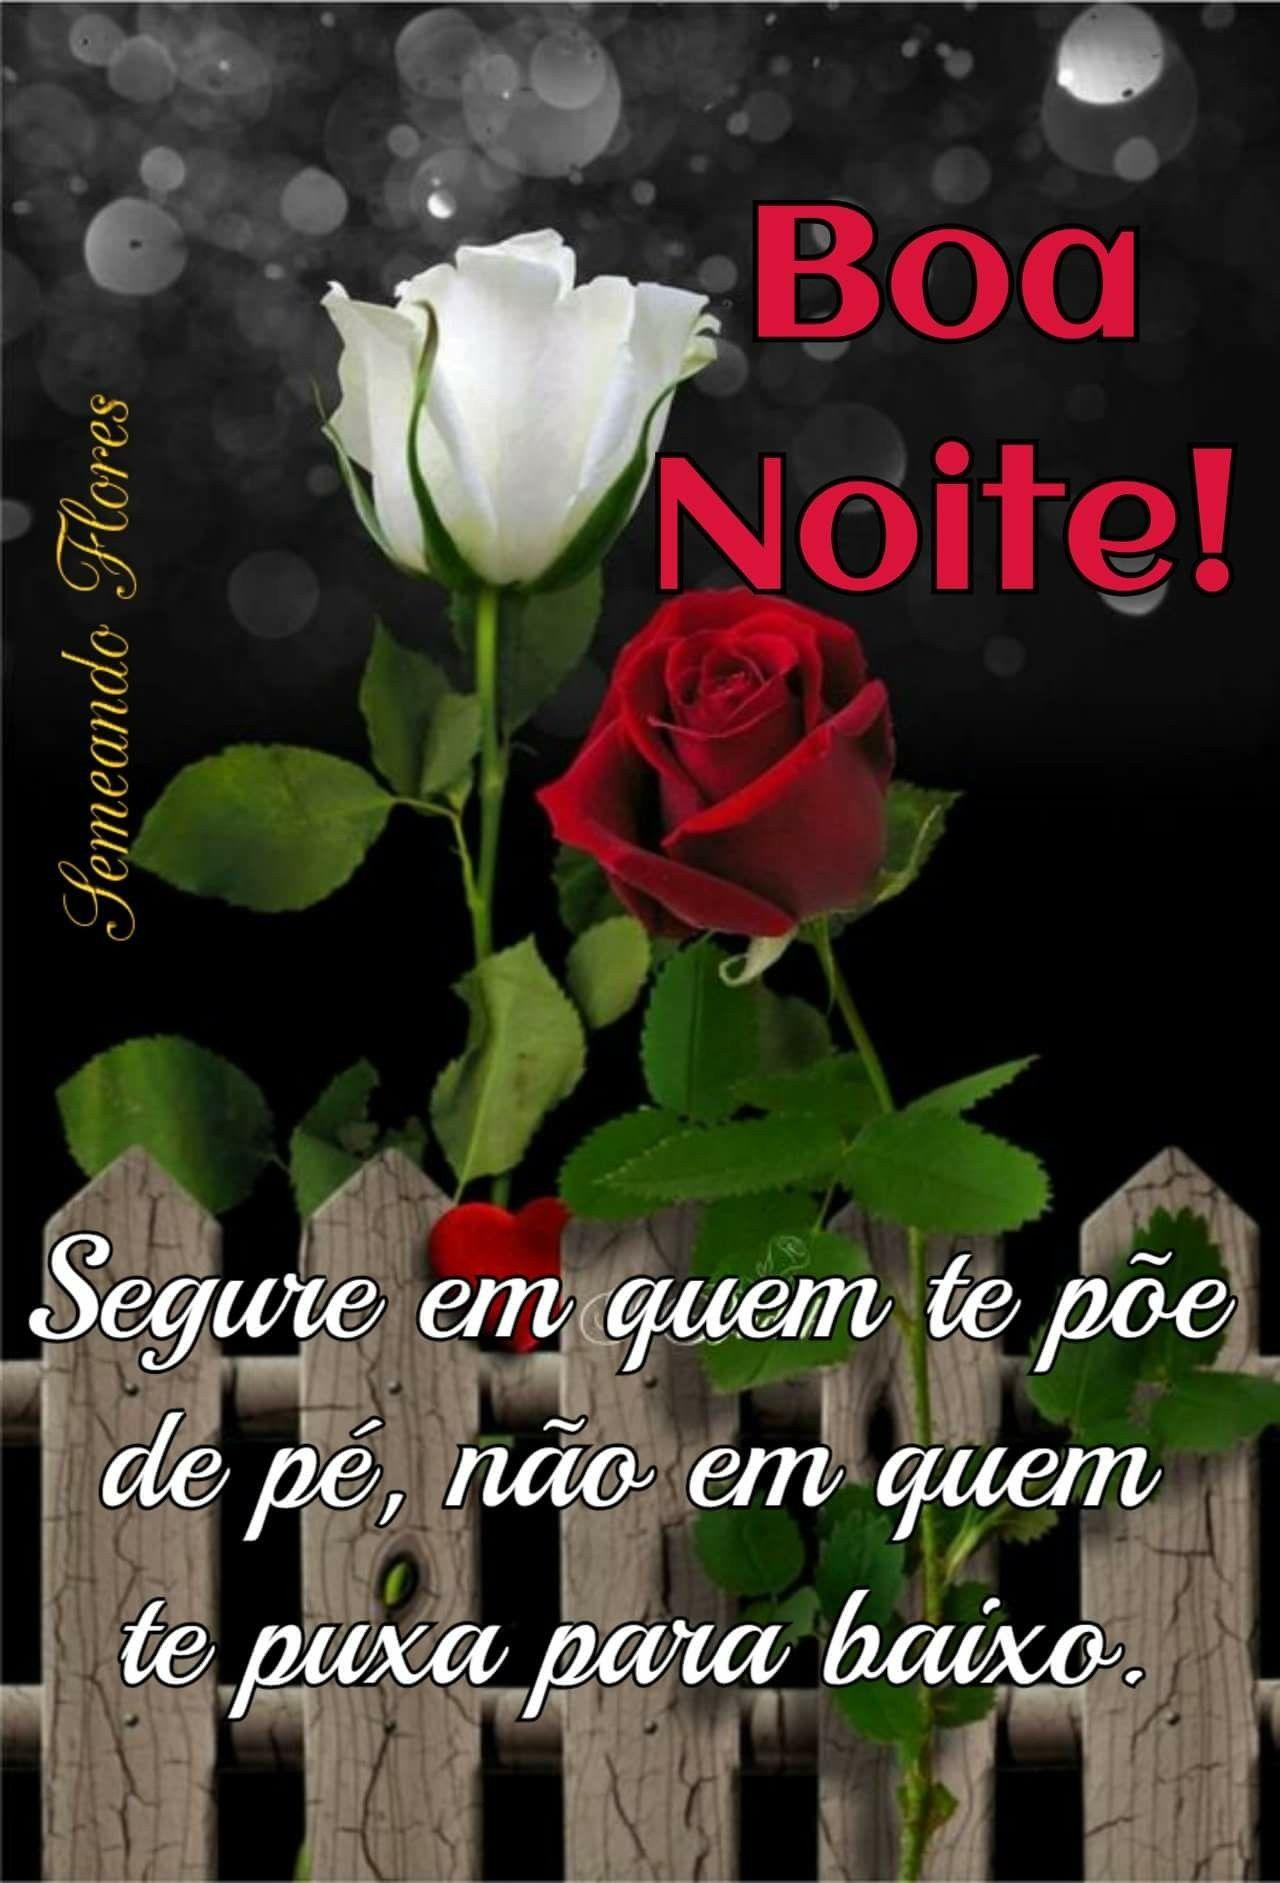 Pin De Joao Carlos Oliveira Em Boa Noite Imagens De Boa